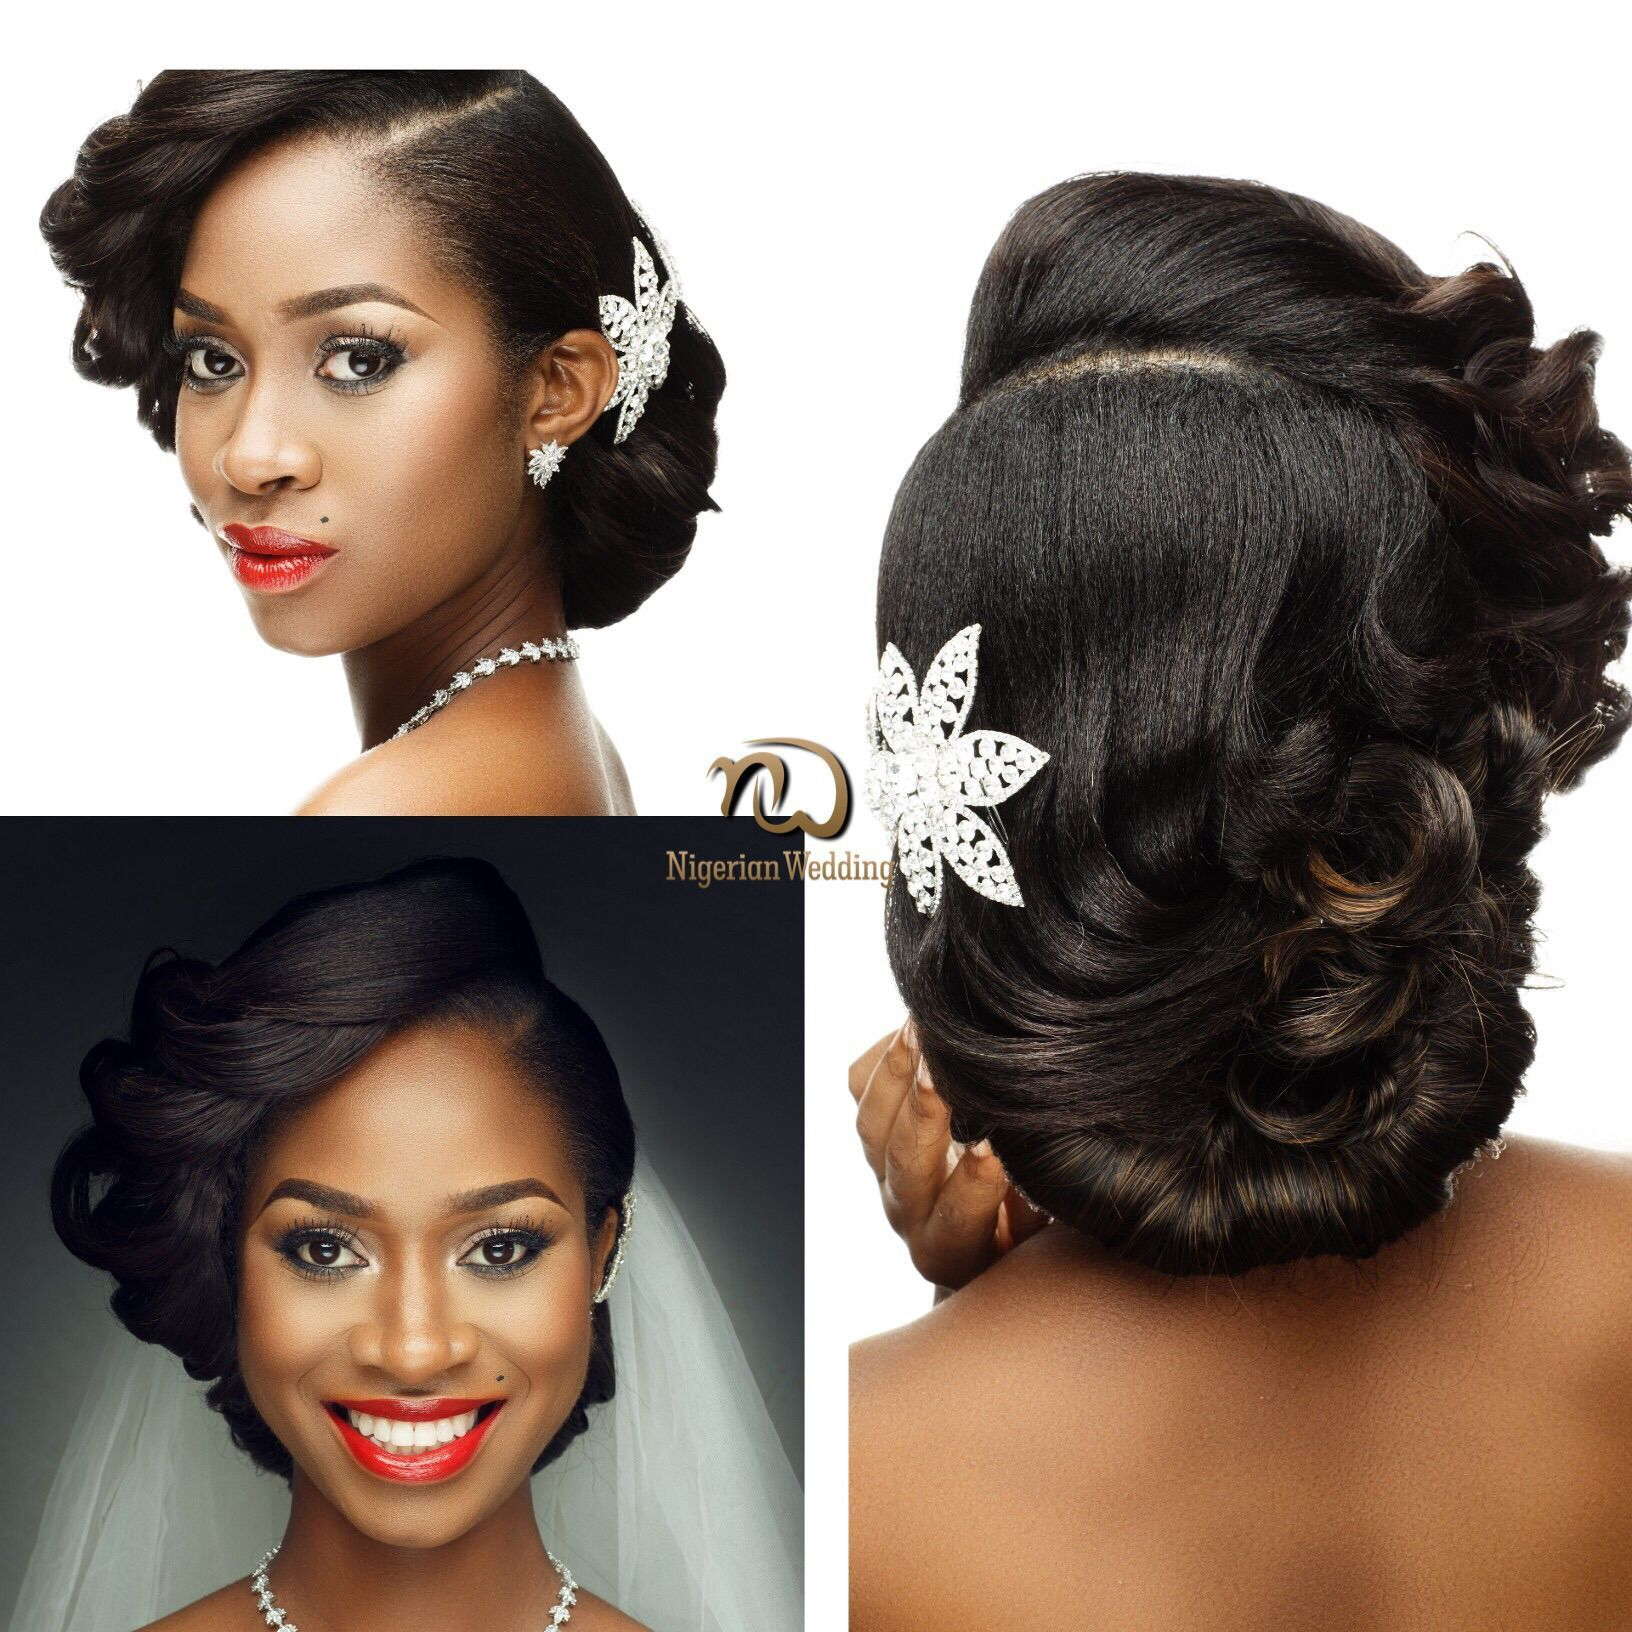 nigerian wedding presents gorgeous bridal hair & makeup